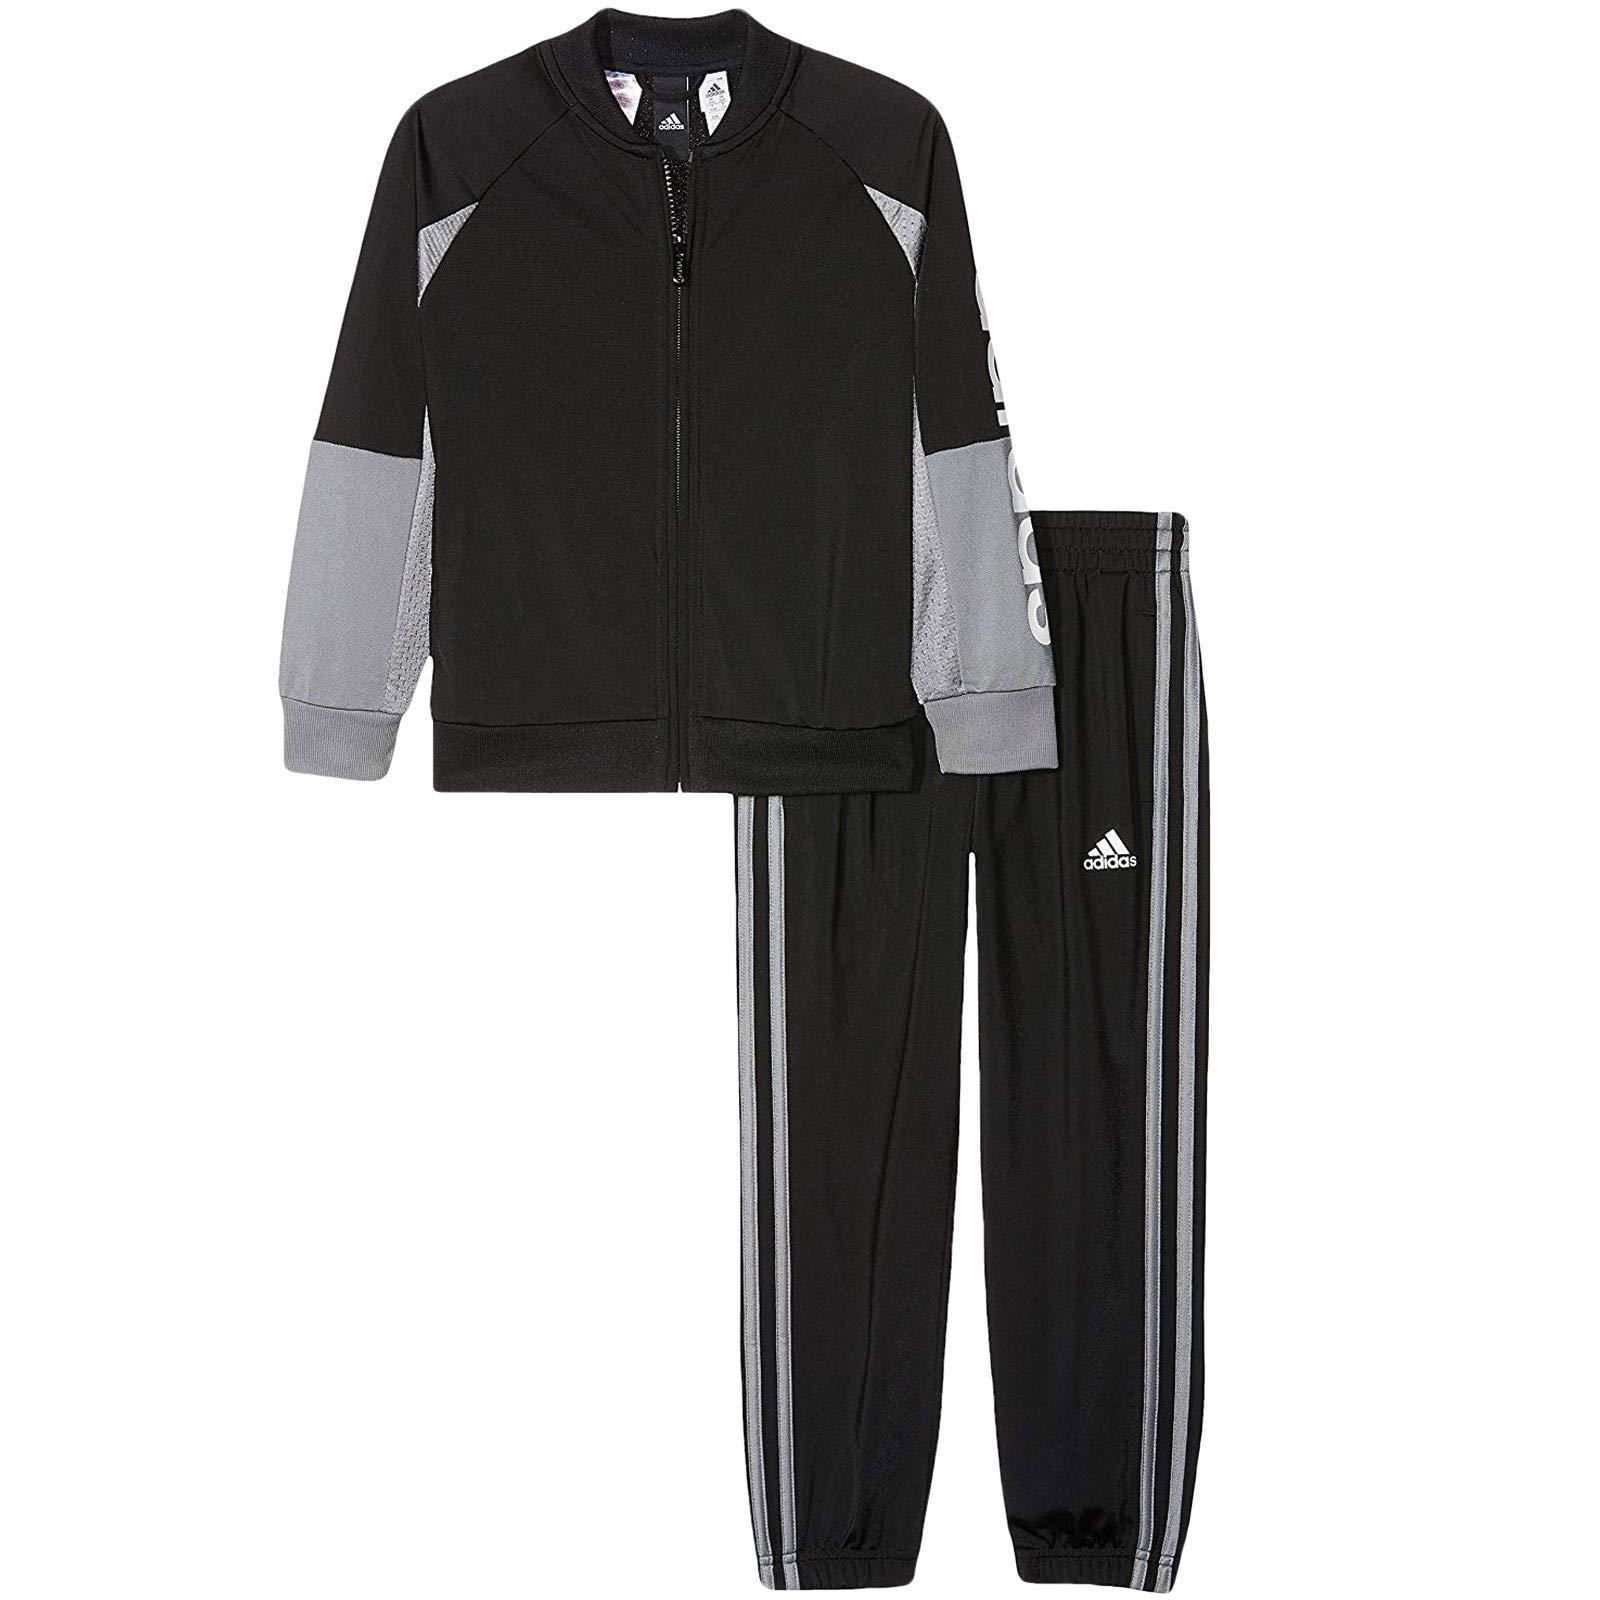 adidas Linear Kids Youth Full Zip Tracksuit Set Black/Grey - 11-12 Years